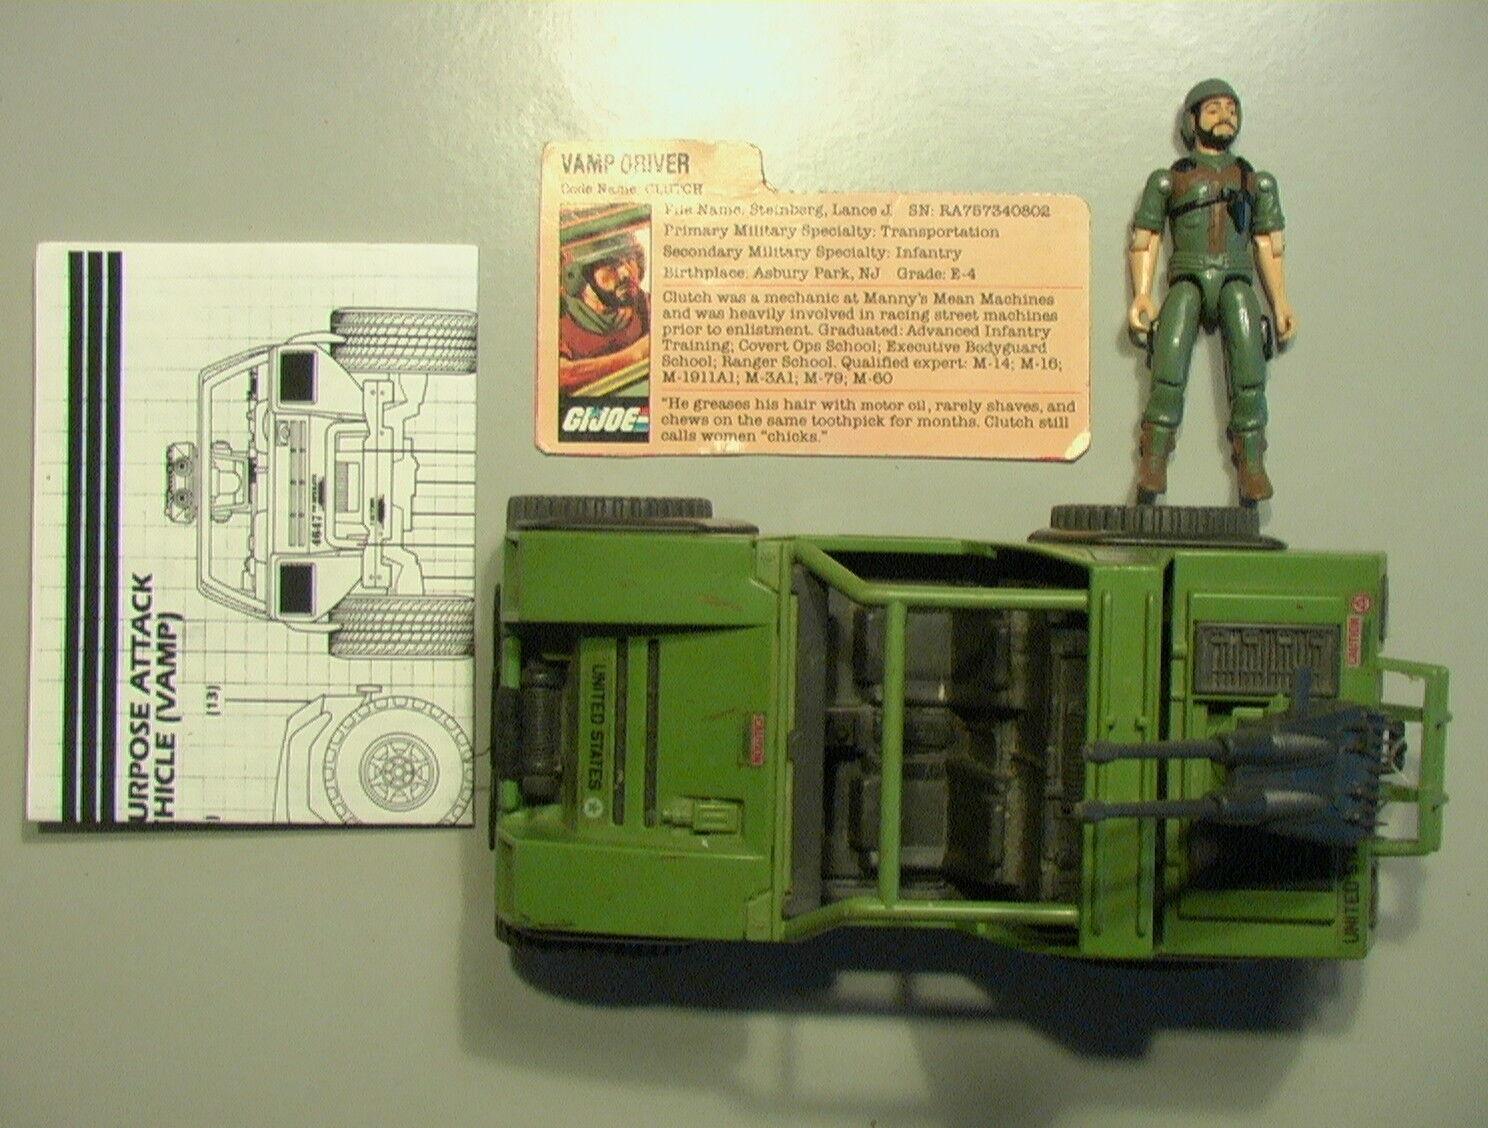 GI Joe VINTAGE 1982 VAMP Mk.I Incompl C-6 w/100% Clutch/Bio/Catalog Hasbro ARAH